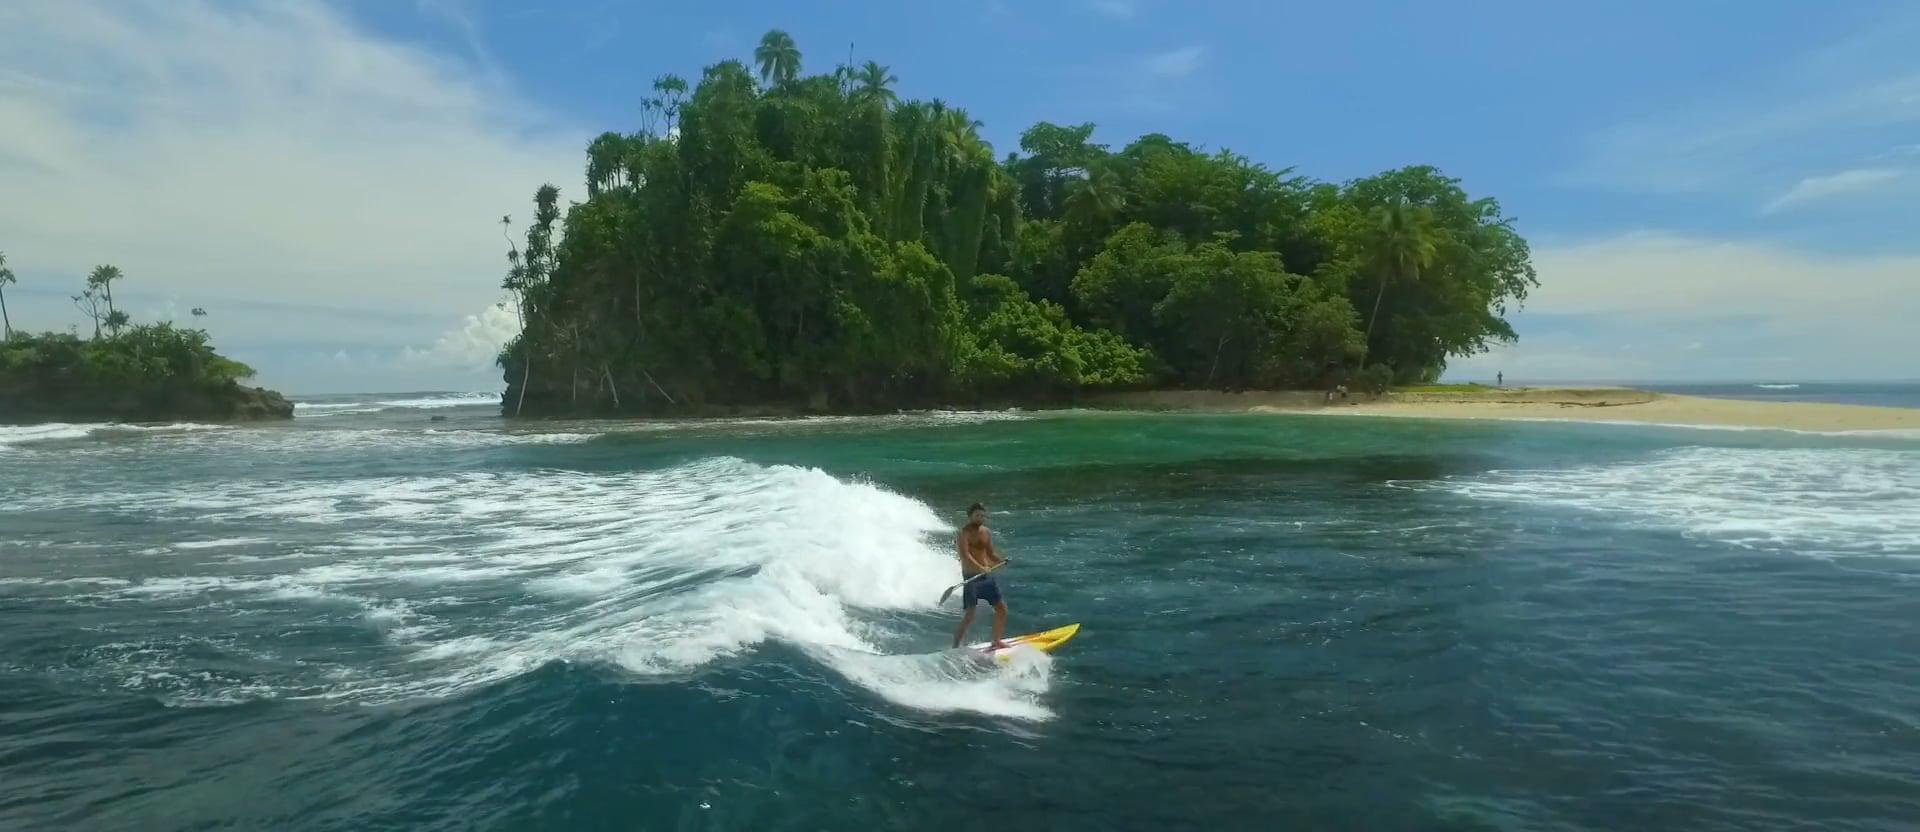 Surfing in Vanimo, Papua New Guinea.